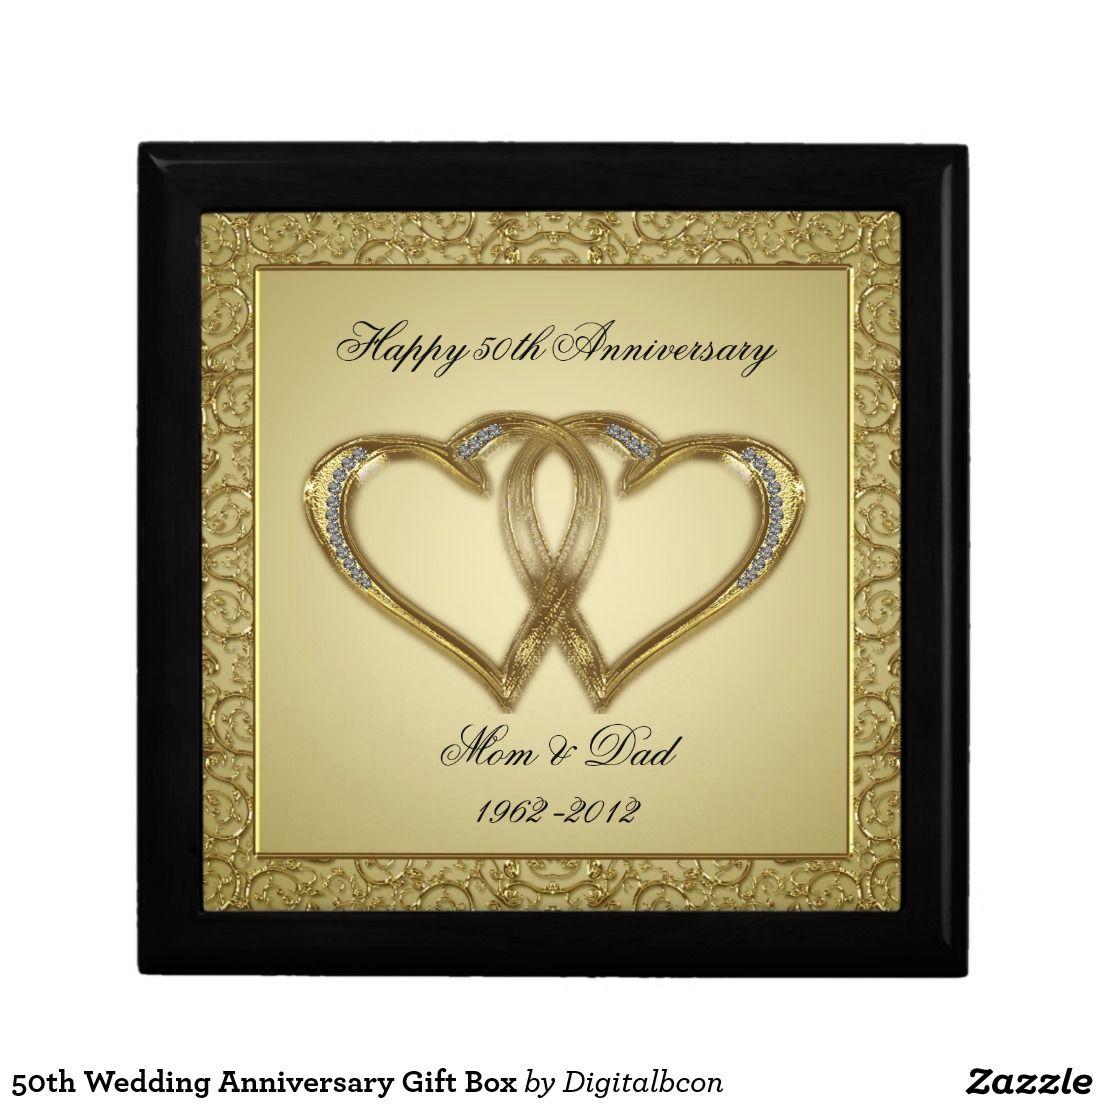 50th Wedding Anniversary Gift Box Zazzle Com 50 Wedding Anniversary Gifts Anniversary Gifts 50th Wedding Anniversary